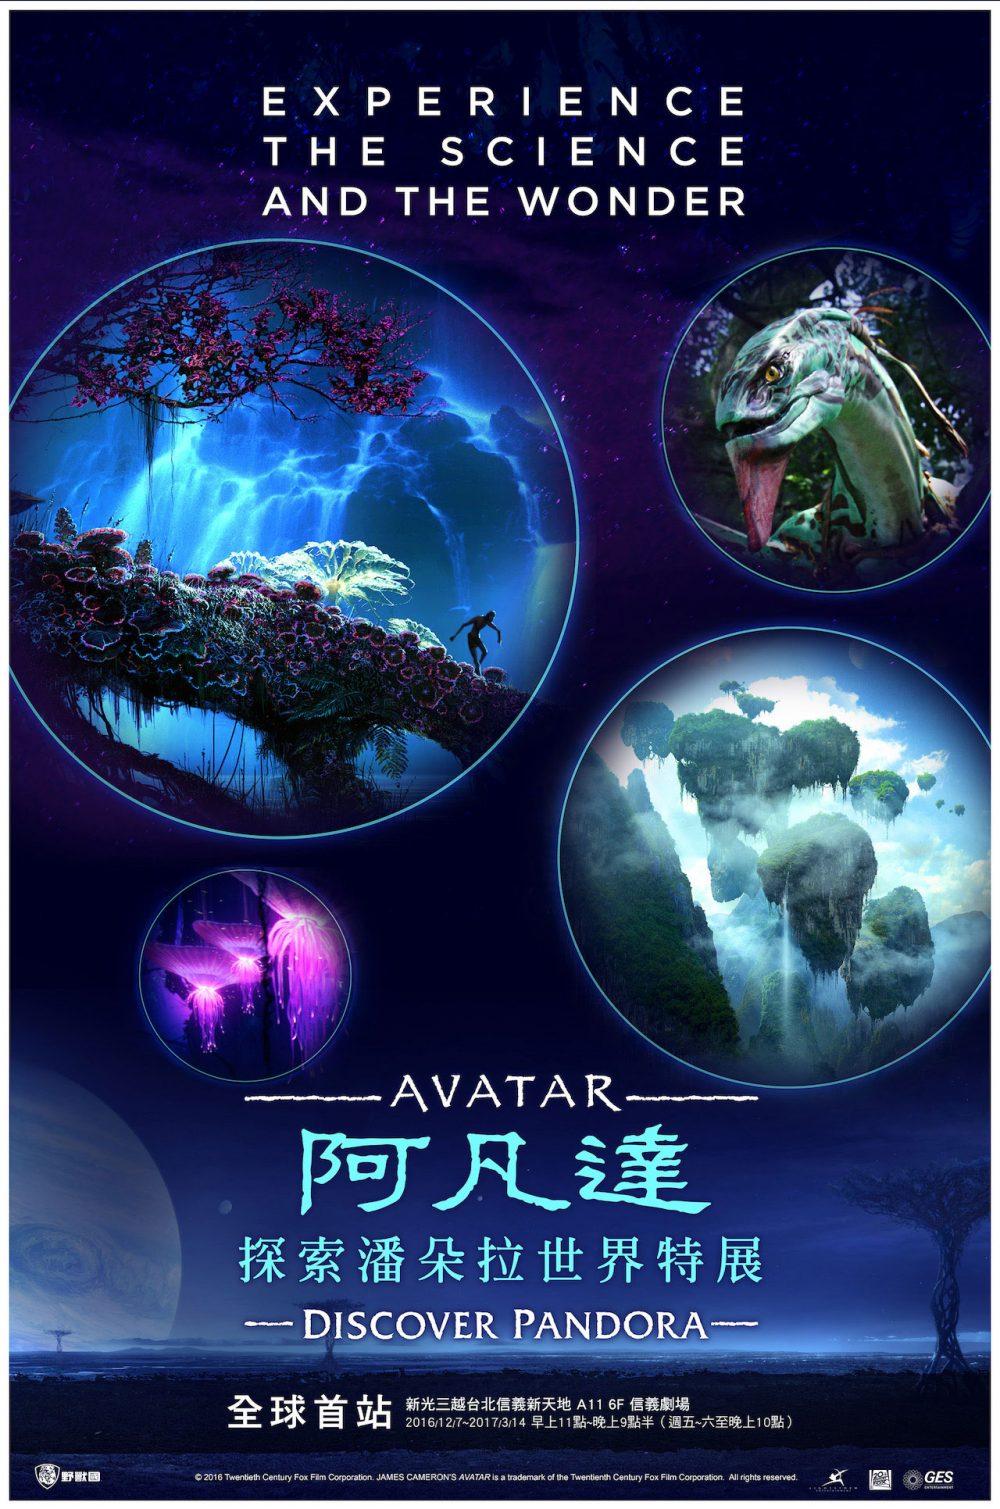 AVATAR: Discover Pandora POSTER